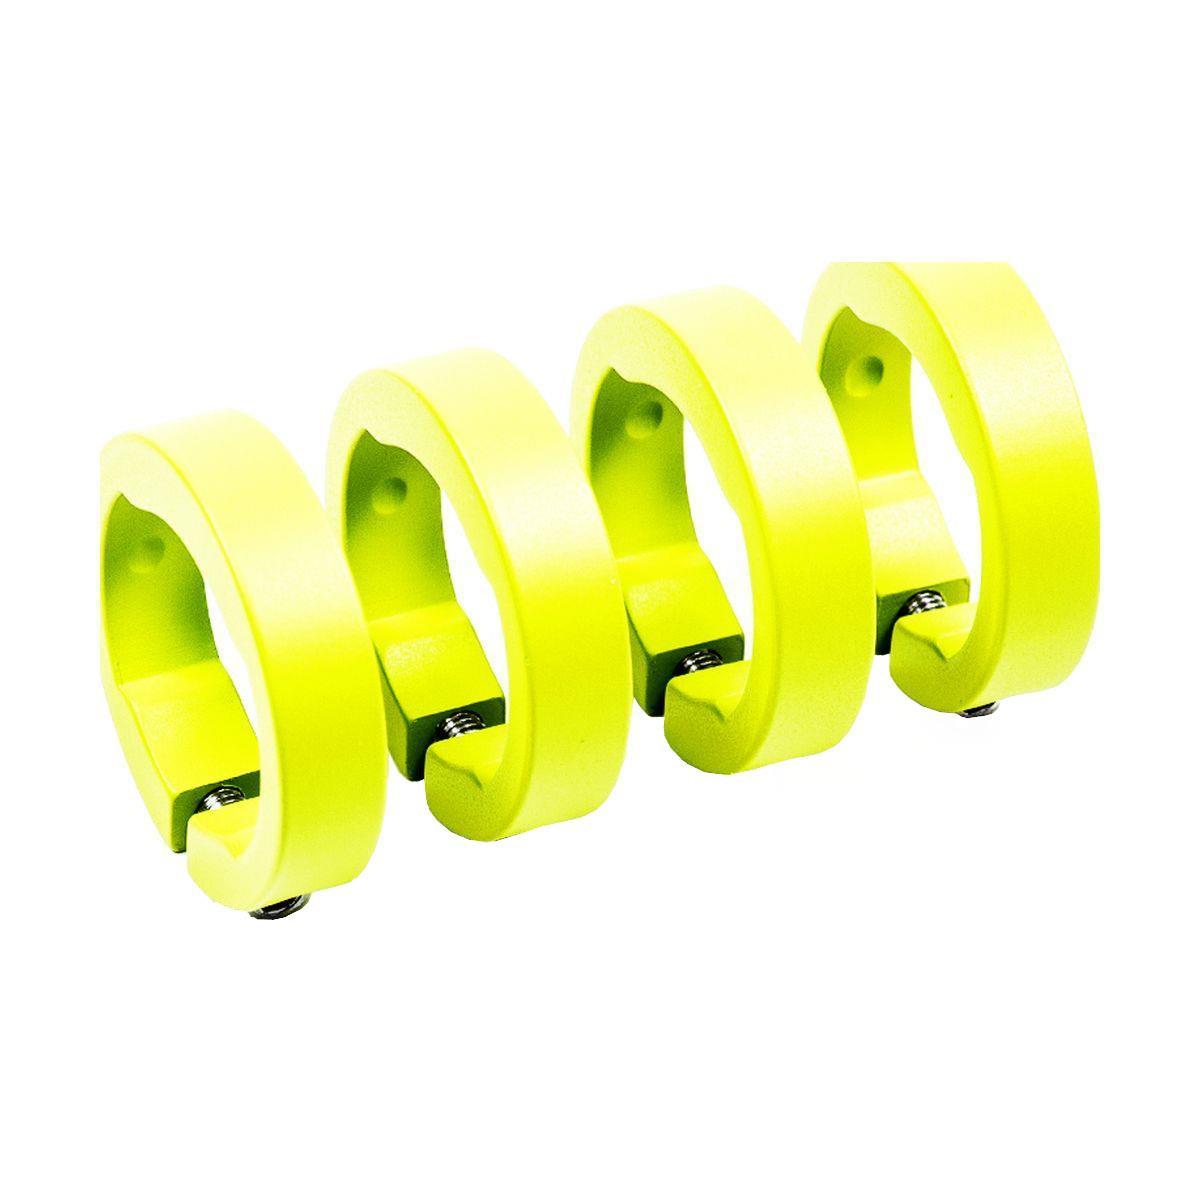 SIXPACK-RACING Klemmringe für Lenkergriffe neon yellow//universal C77